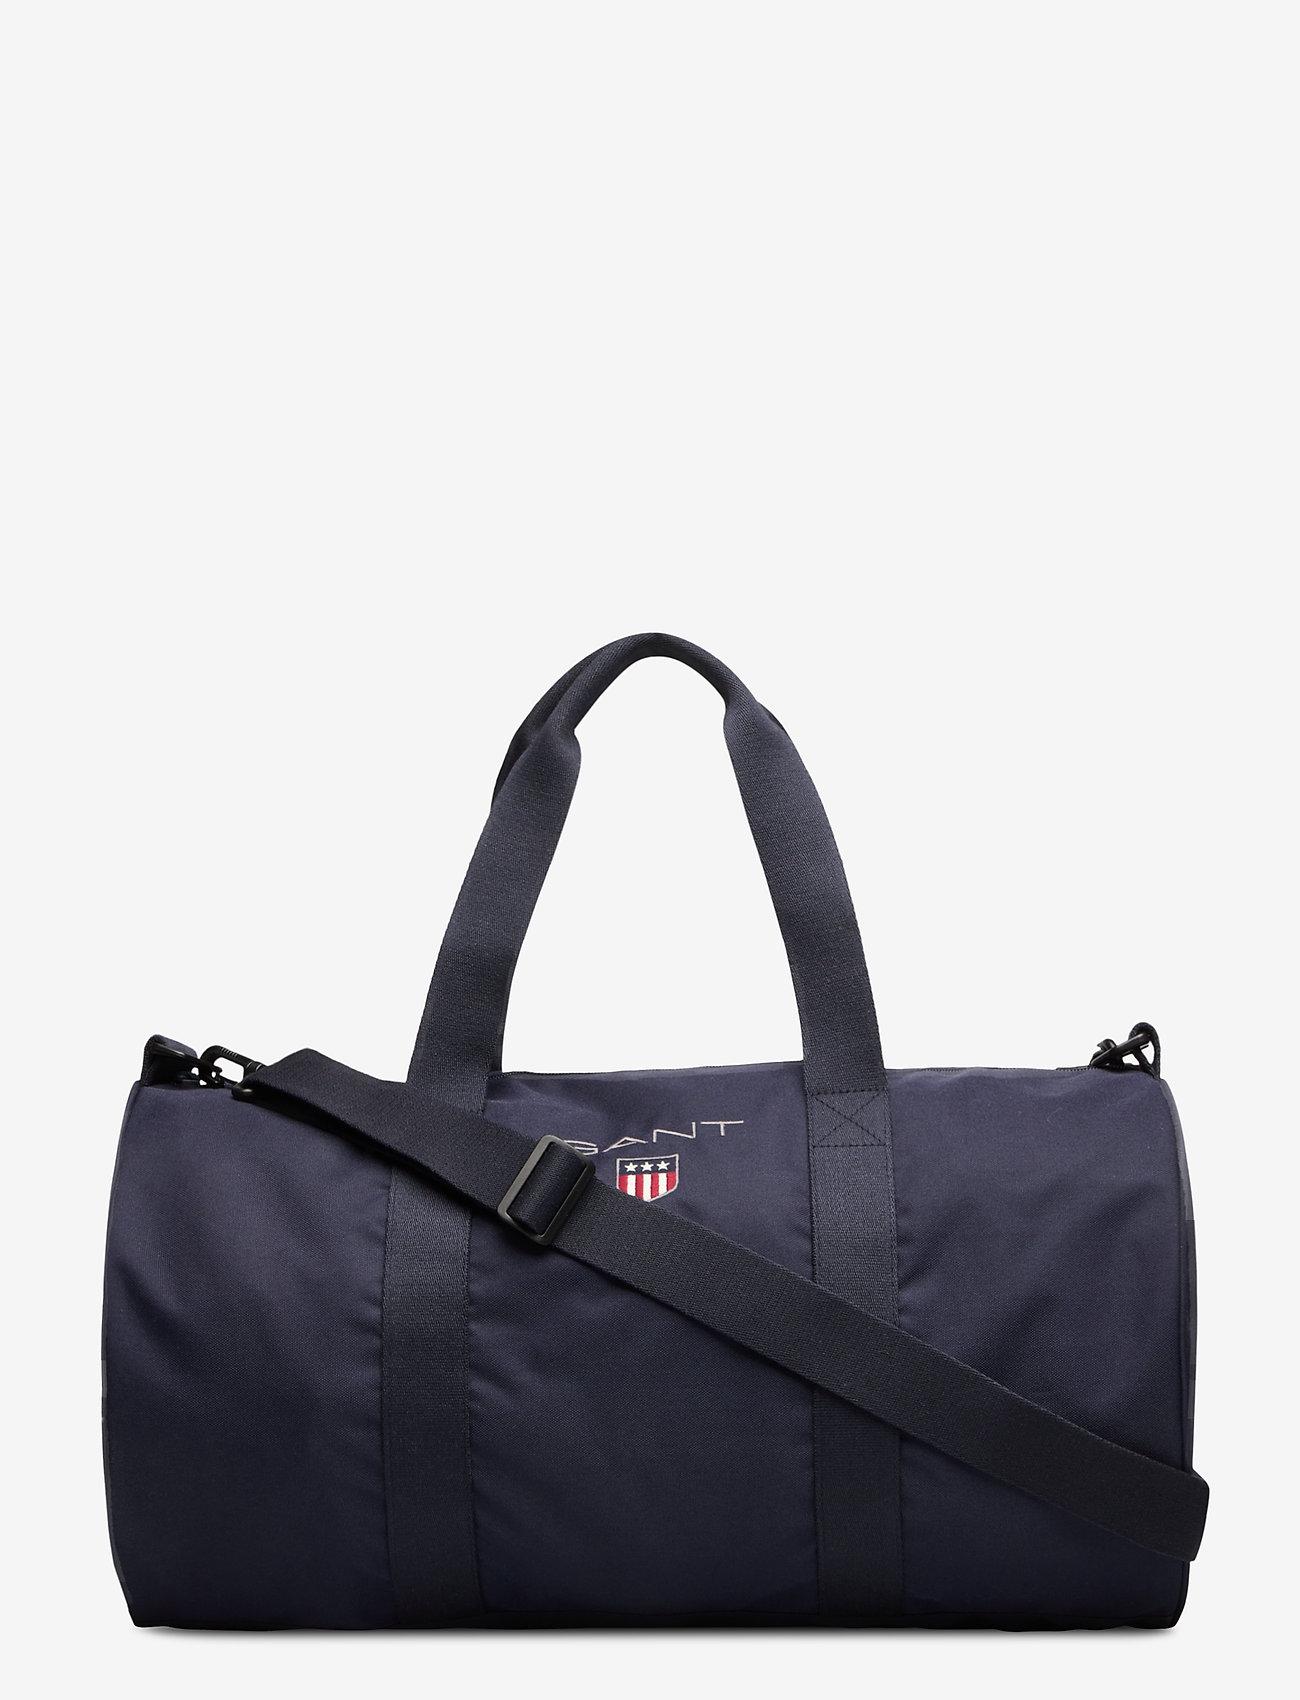 GANT - D1. MEDIUM SHIELD GYM BAG - totes & small bags - evening blue - 1